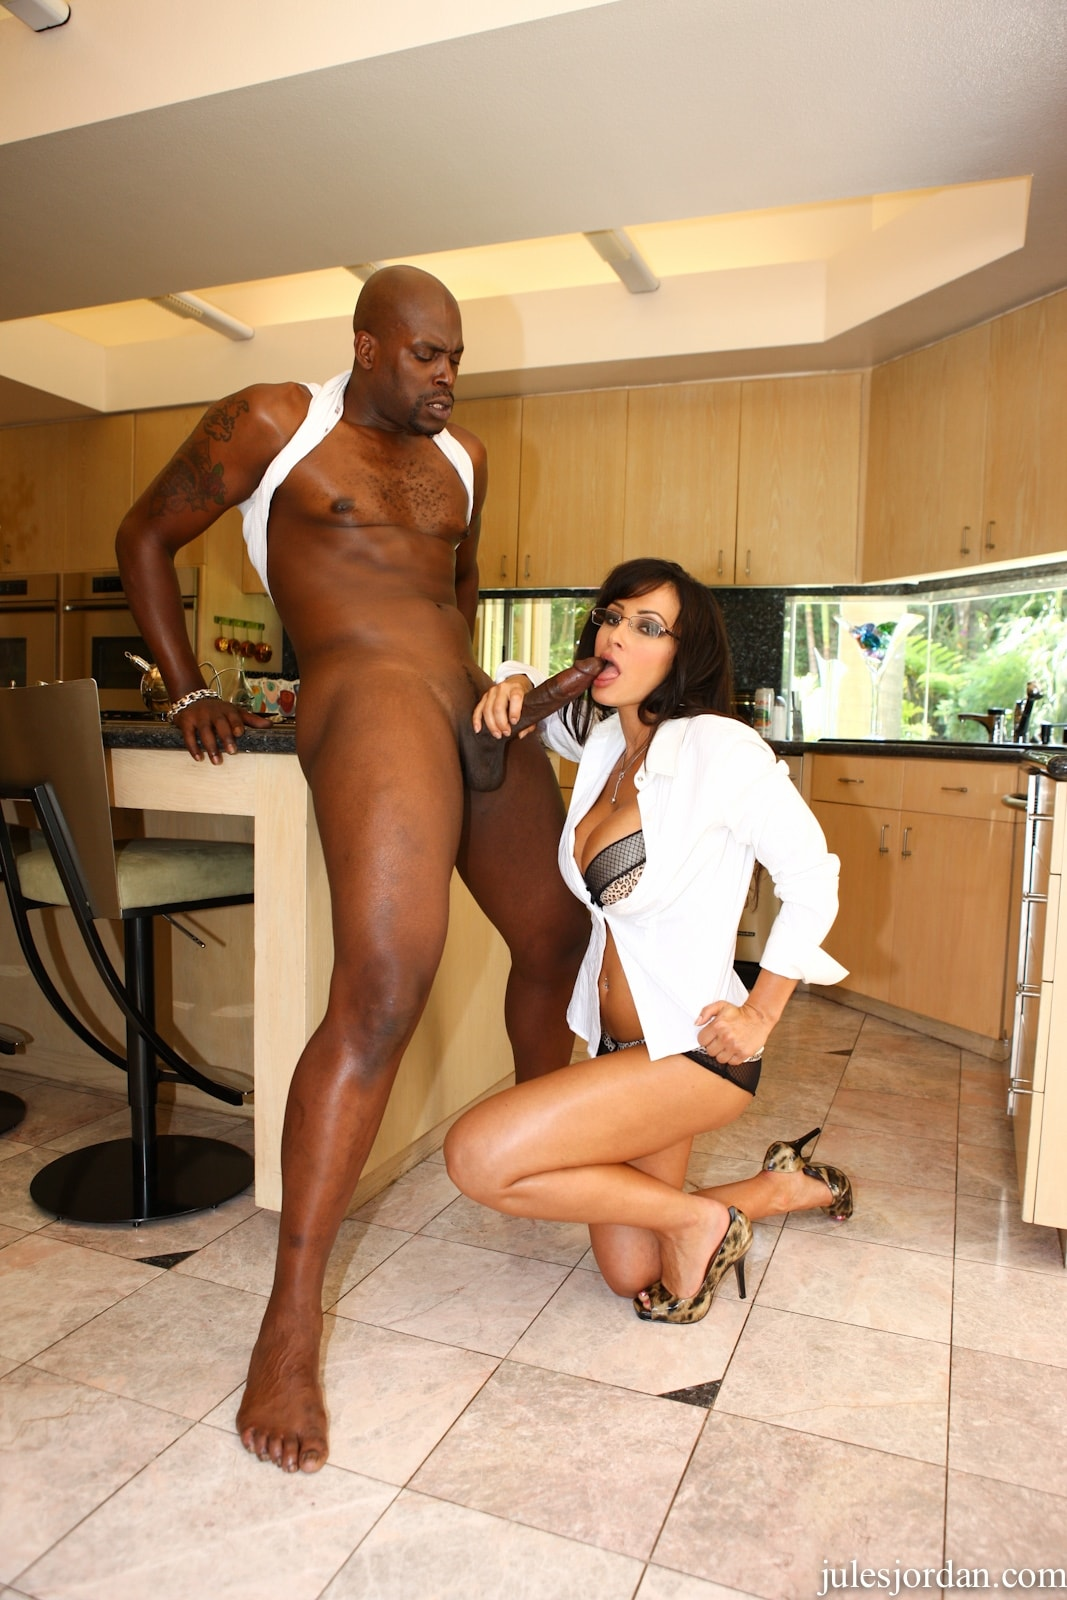 Jules Jordan 'vs Lex Monster Cock Interracial Sex' starring Lisa Ann (Photo 14)